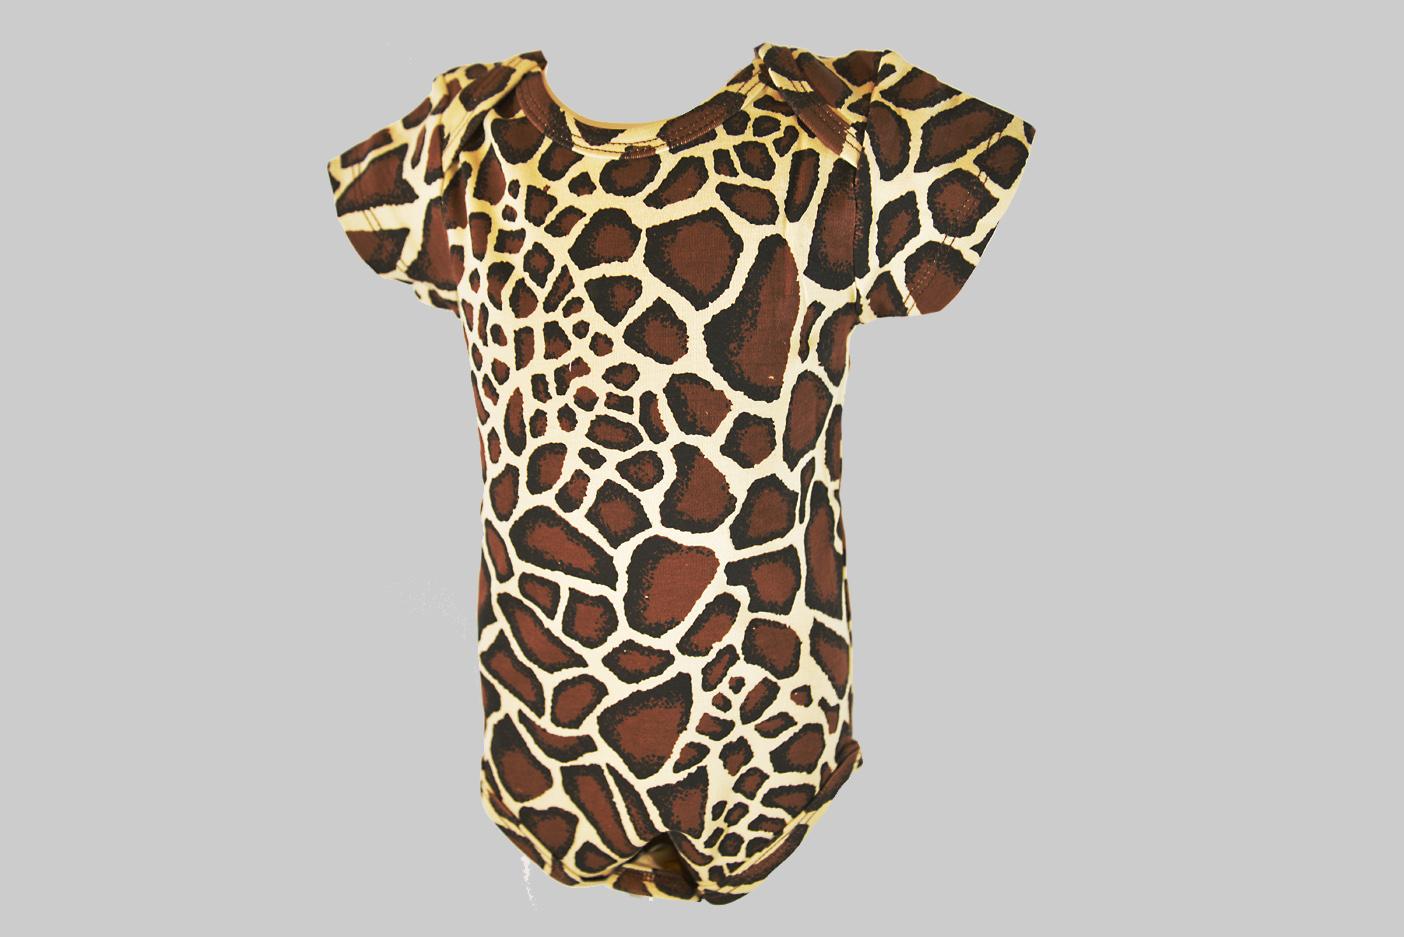 Giraffe Baby Jumpsuit